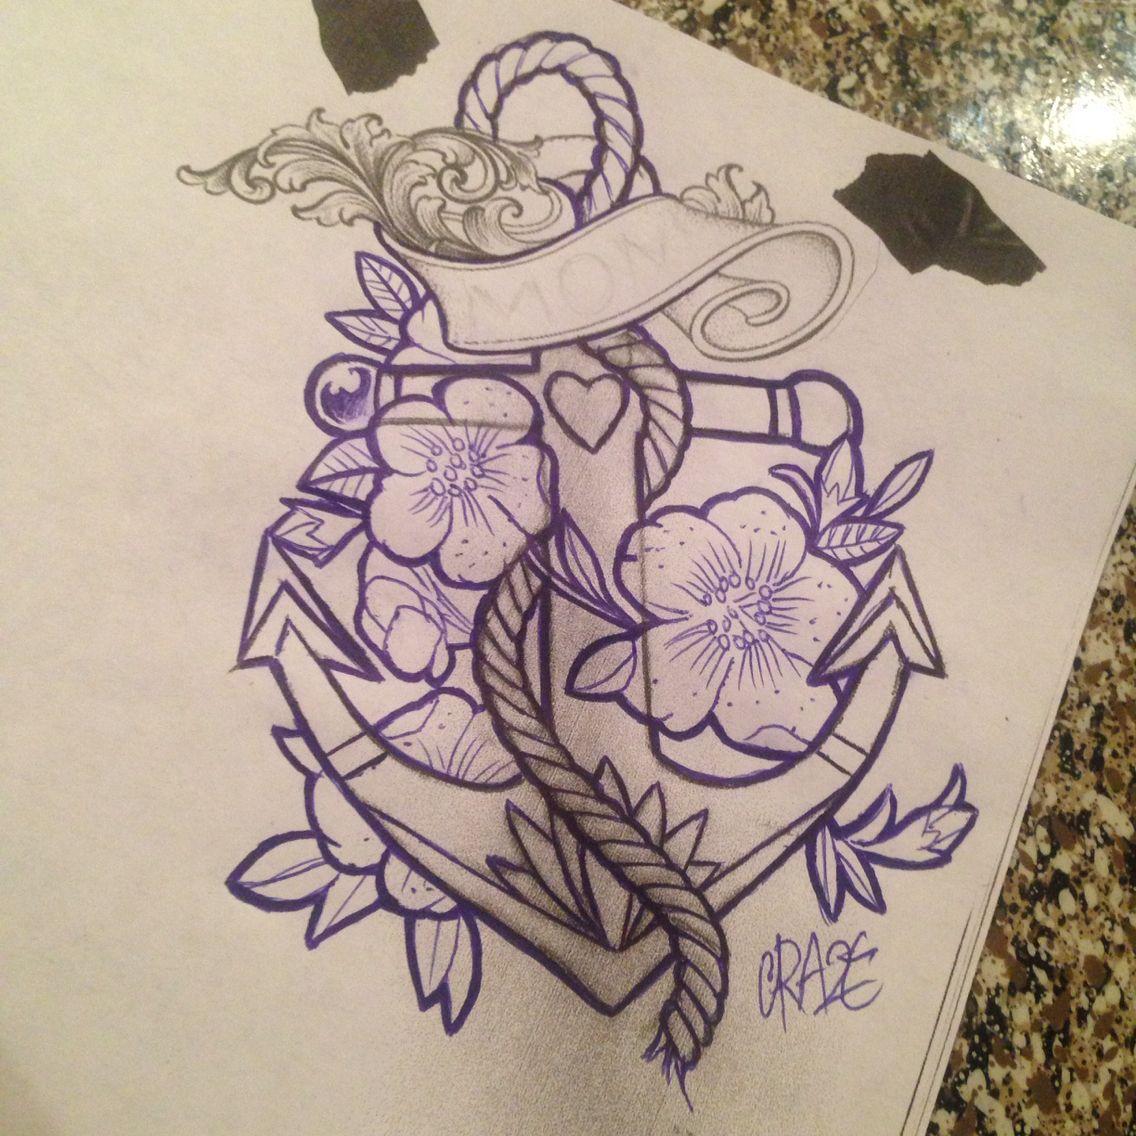 Mom anchor tattoo jasmine flowers banner crazetats sketches and mom anchor tattoo jasmine flowers banner crazetats izmirmasajfo Images